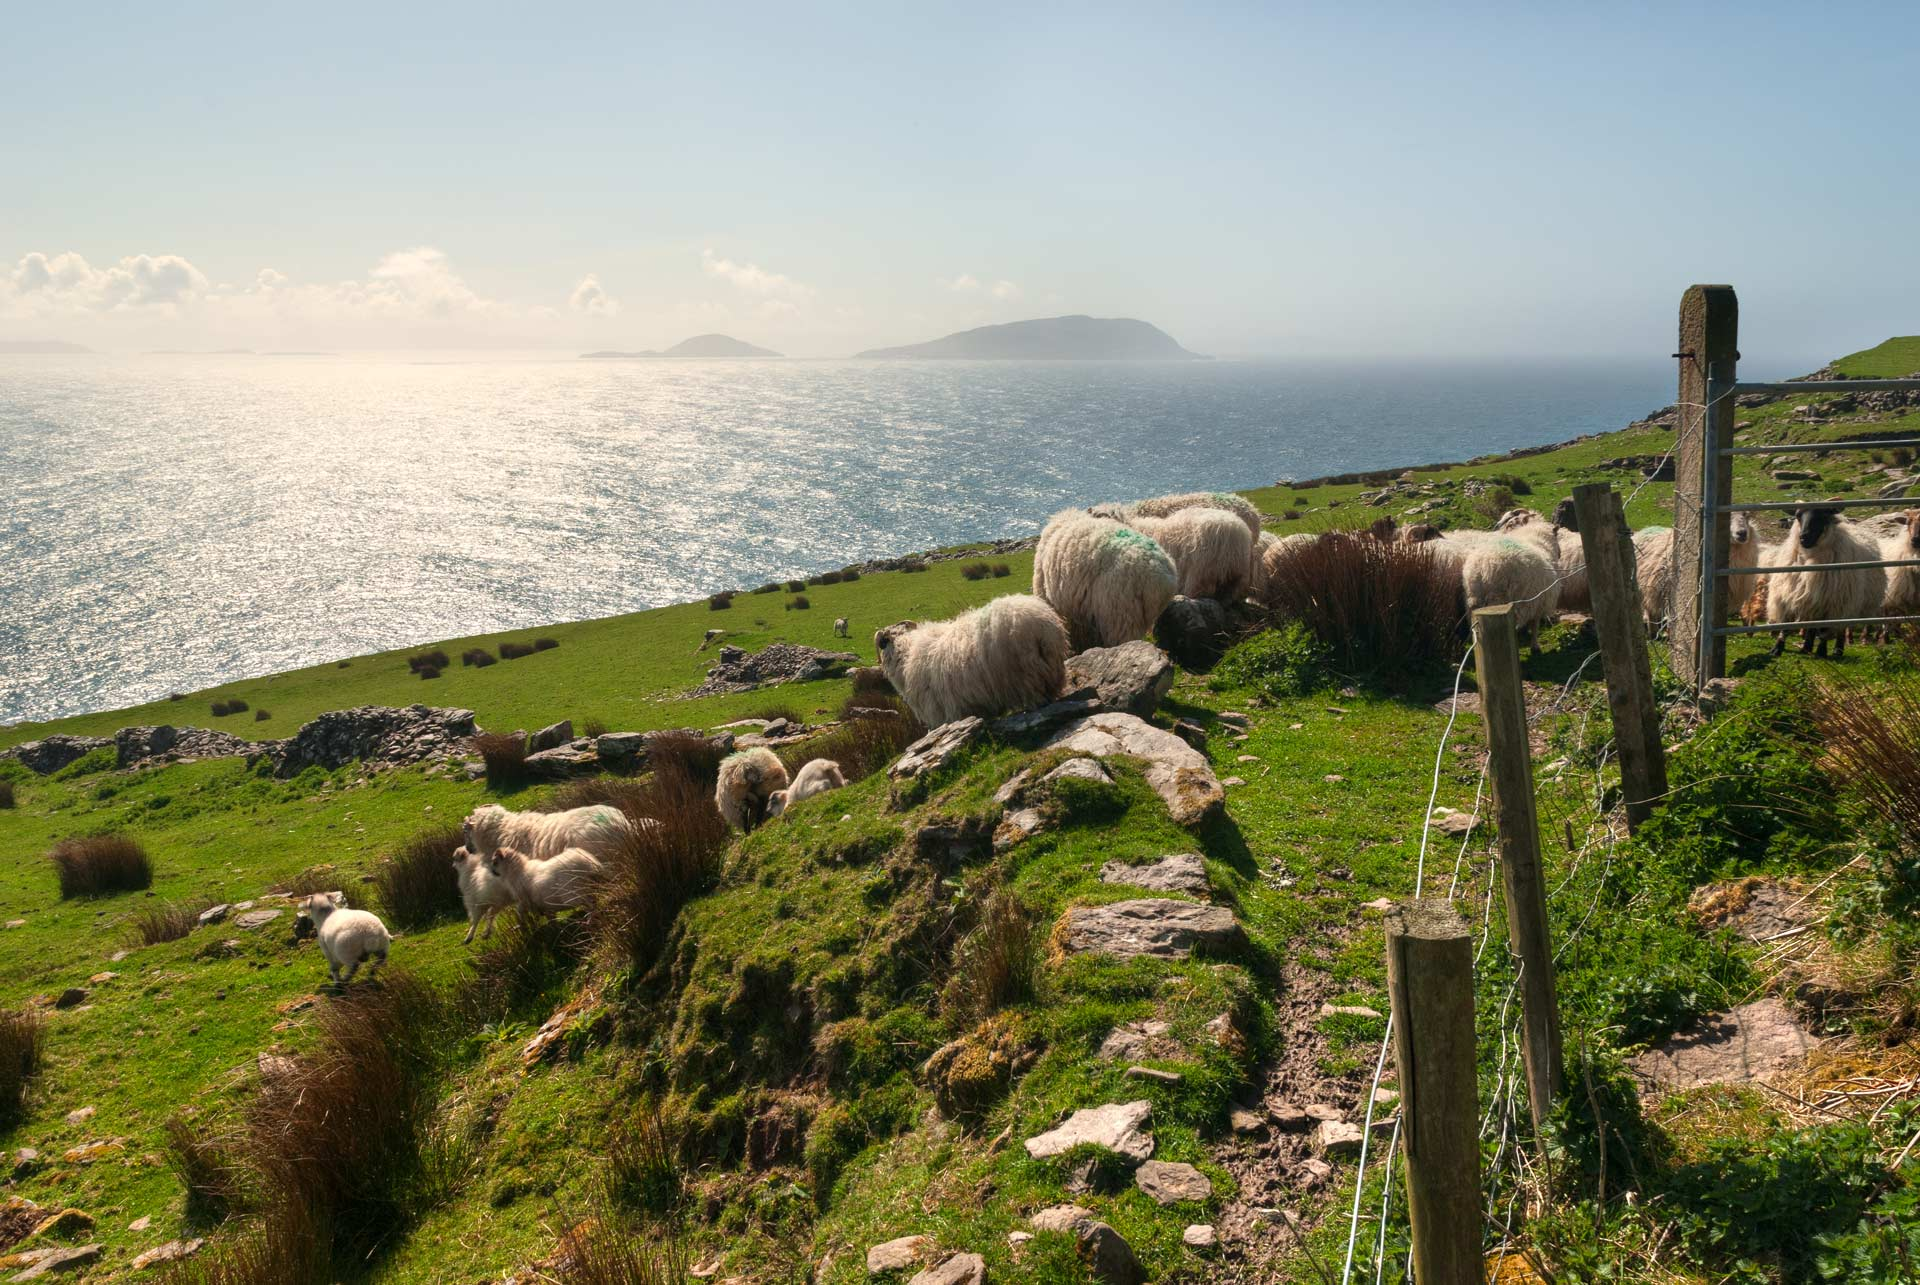 Sheep grazing the grass off Slea Head in Dingle, Ireland